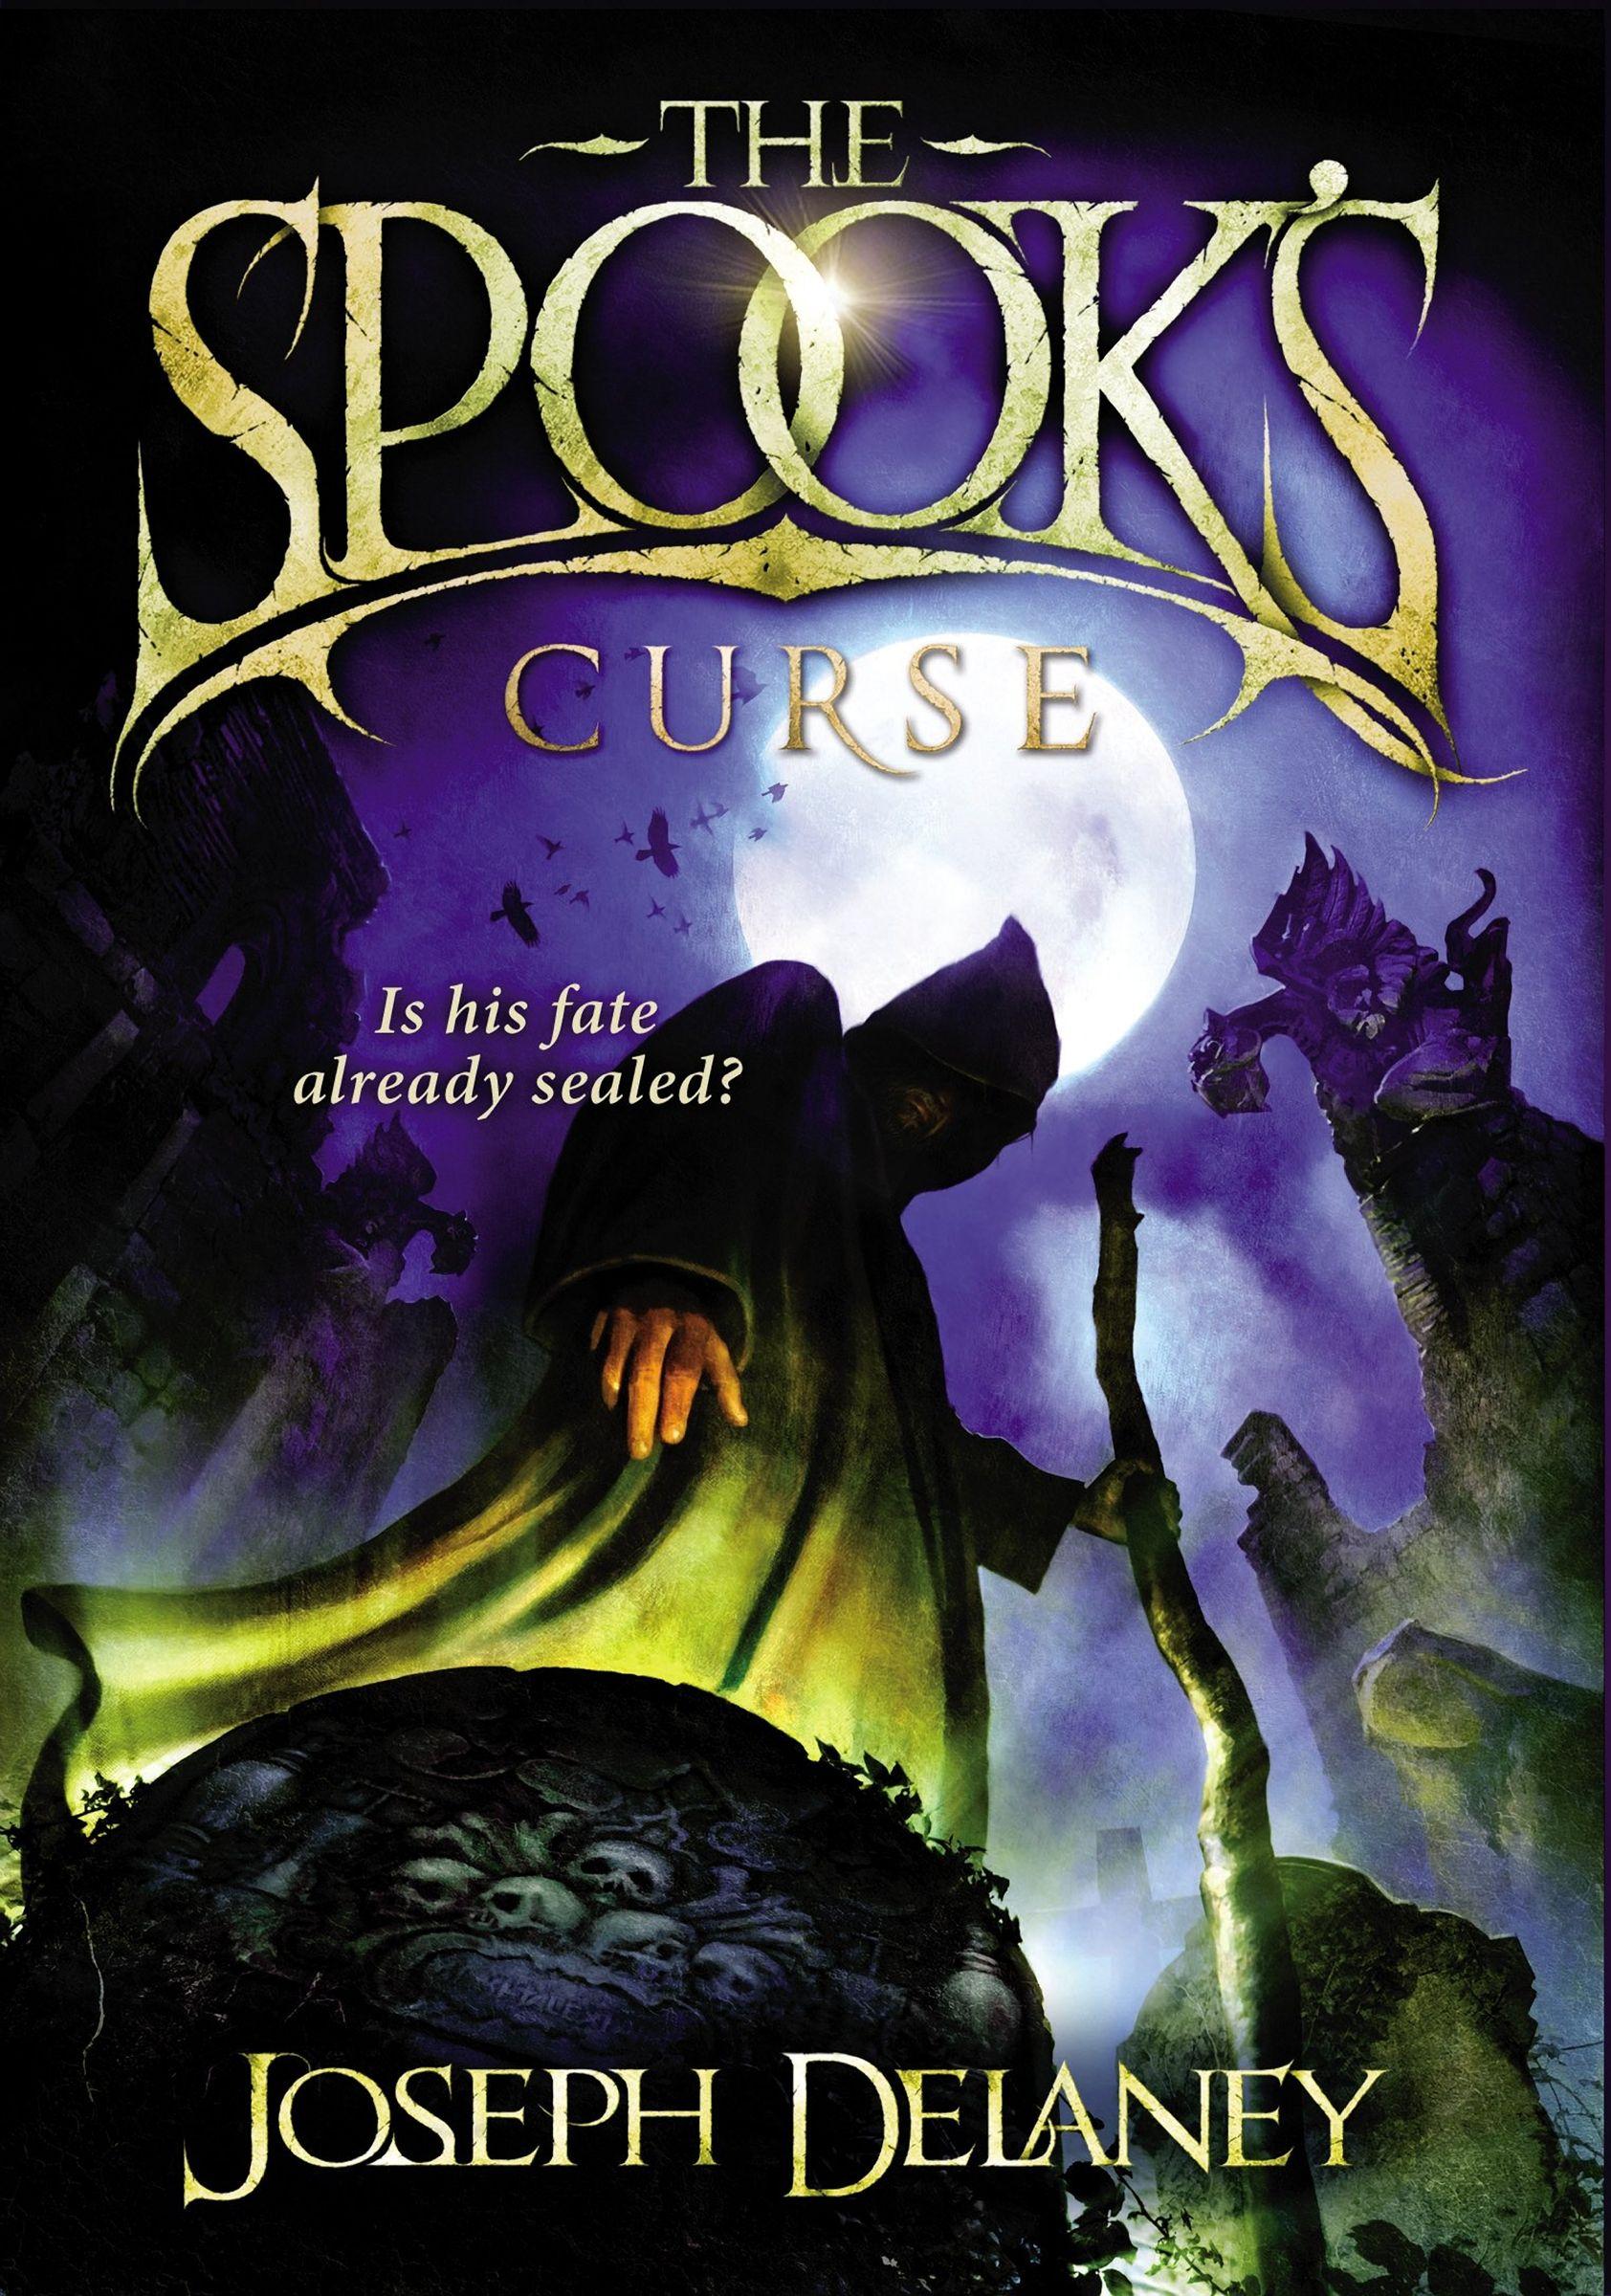 Joseph Delaney  (the Wardstone Chronicles #2) The Spook's Curse